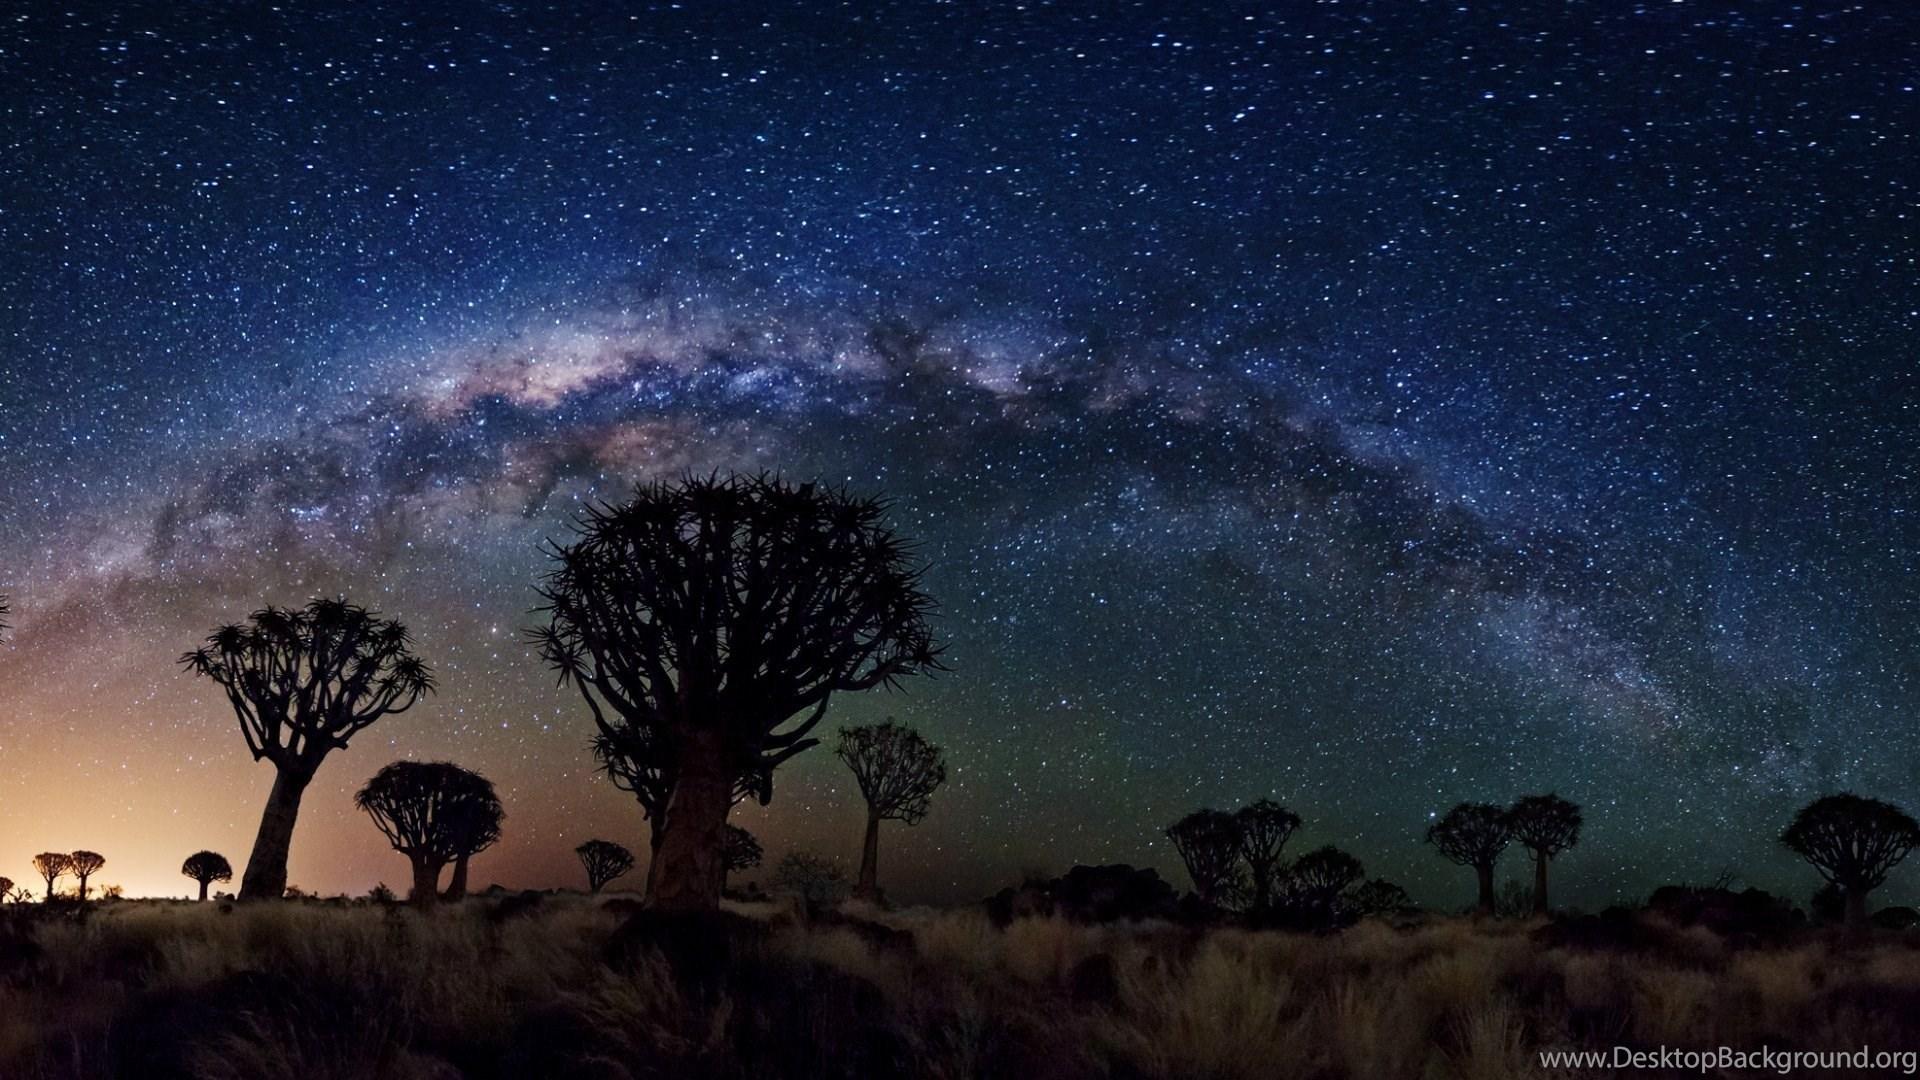 Milky Way Galaxy Wallpaper Nasa